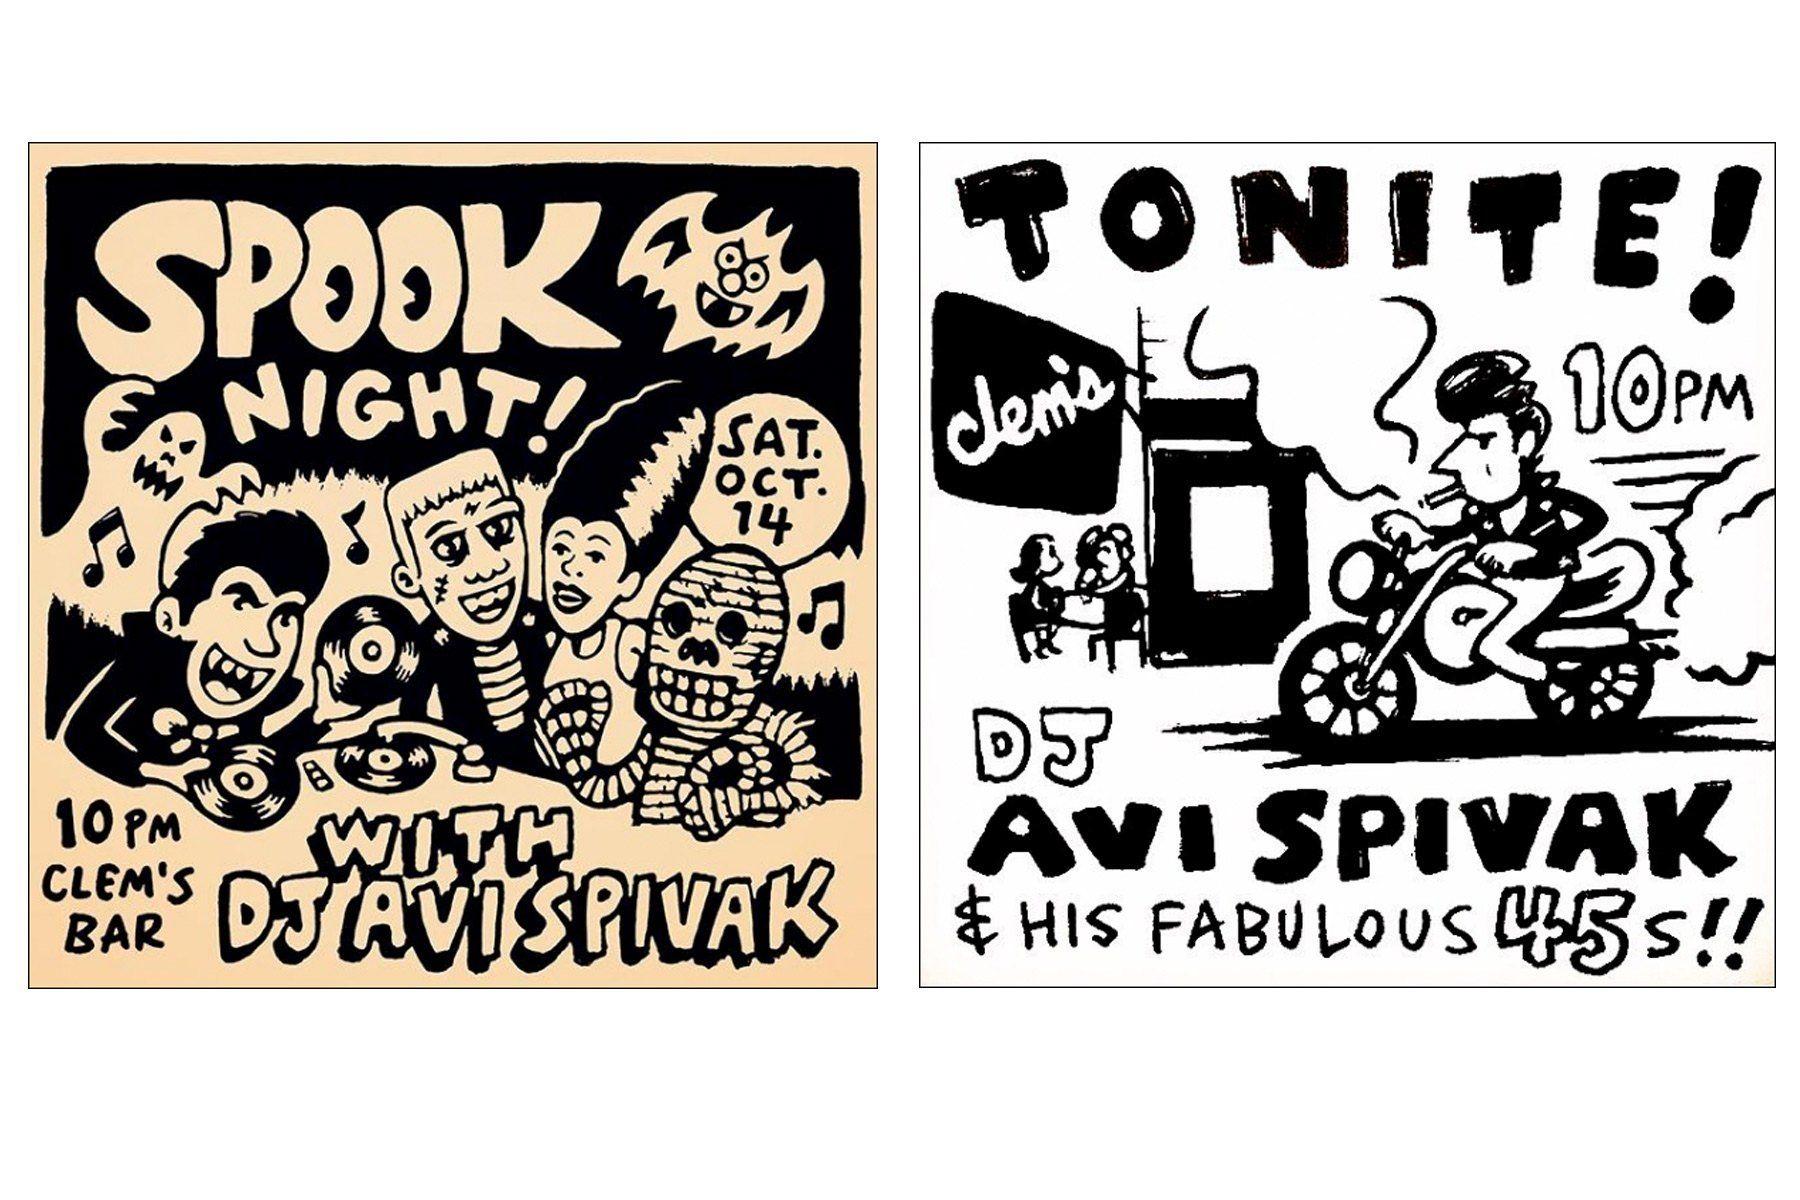 Clem's Bar flyers by artist Avi Spivak. Ponyboy magazine.